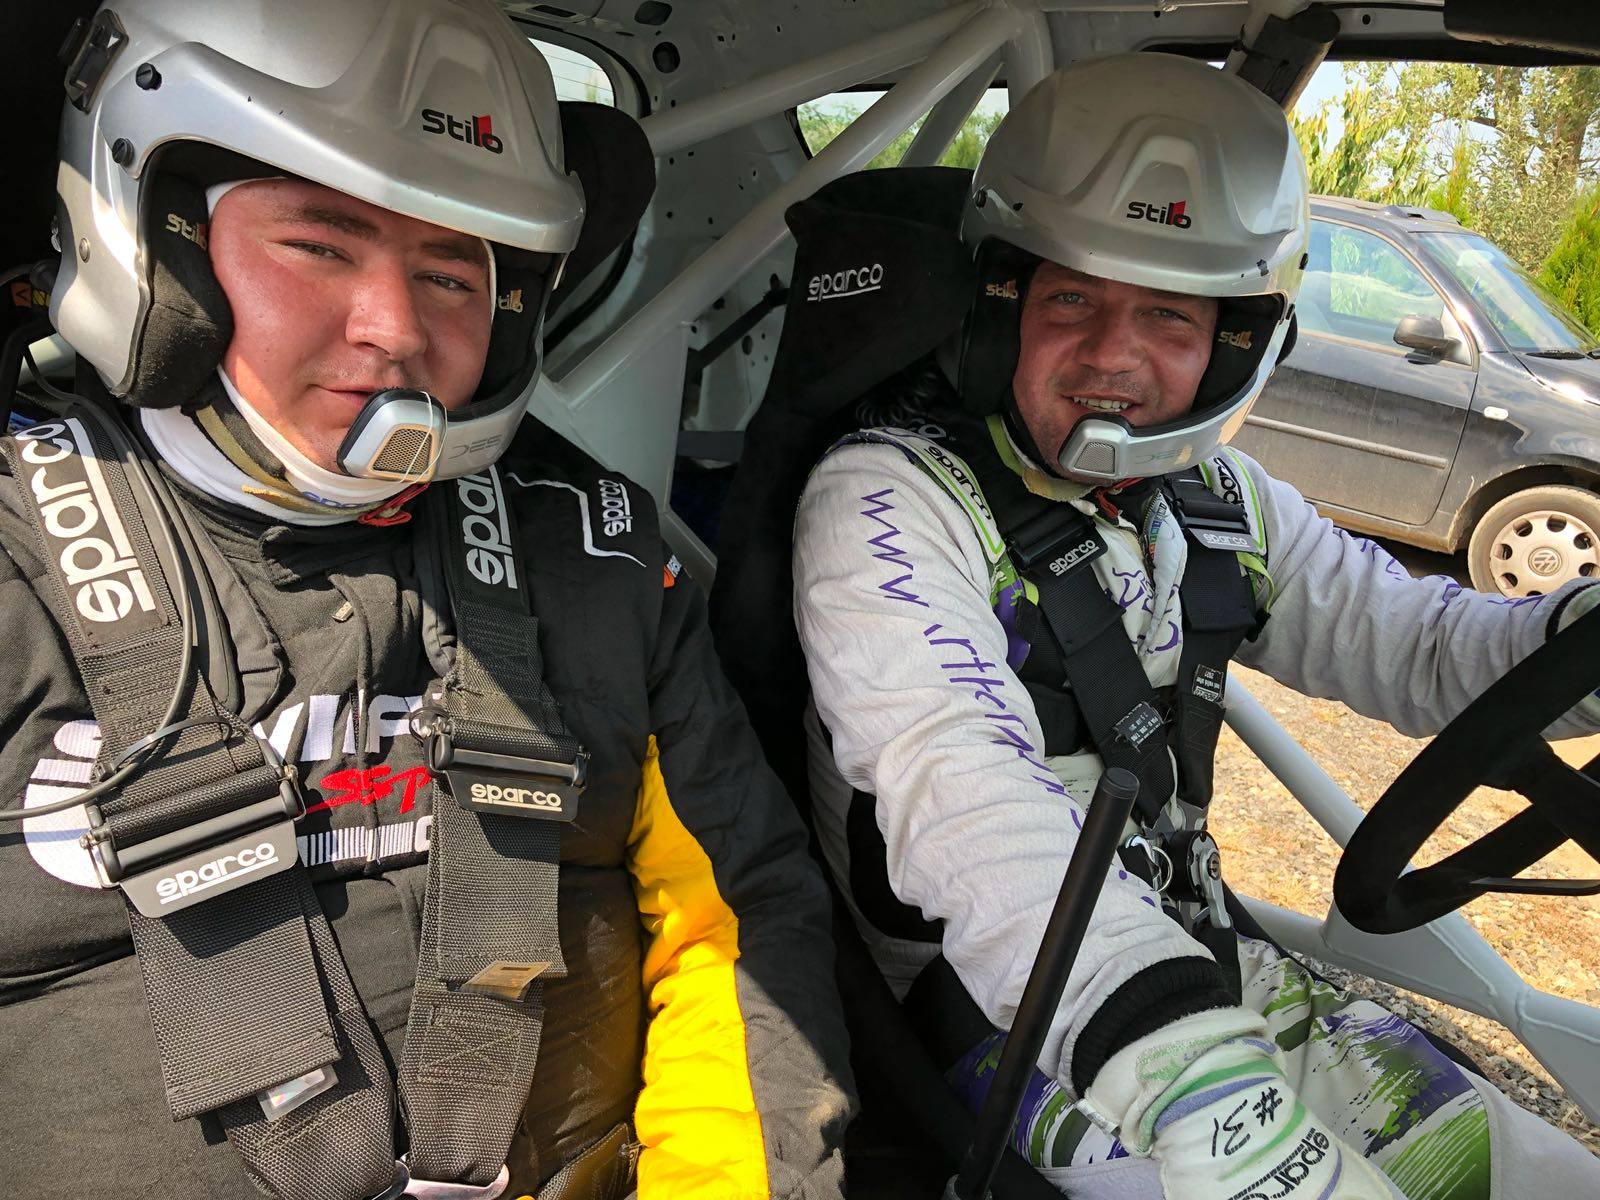 Alex Ardelean revine in CNR-D in Cupa Suzuki, alaturi de un nou copilot, Mircea Patru